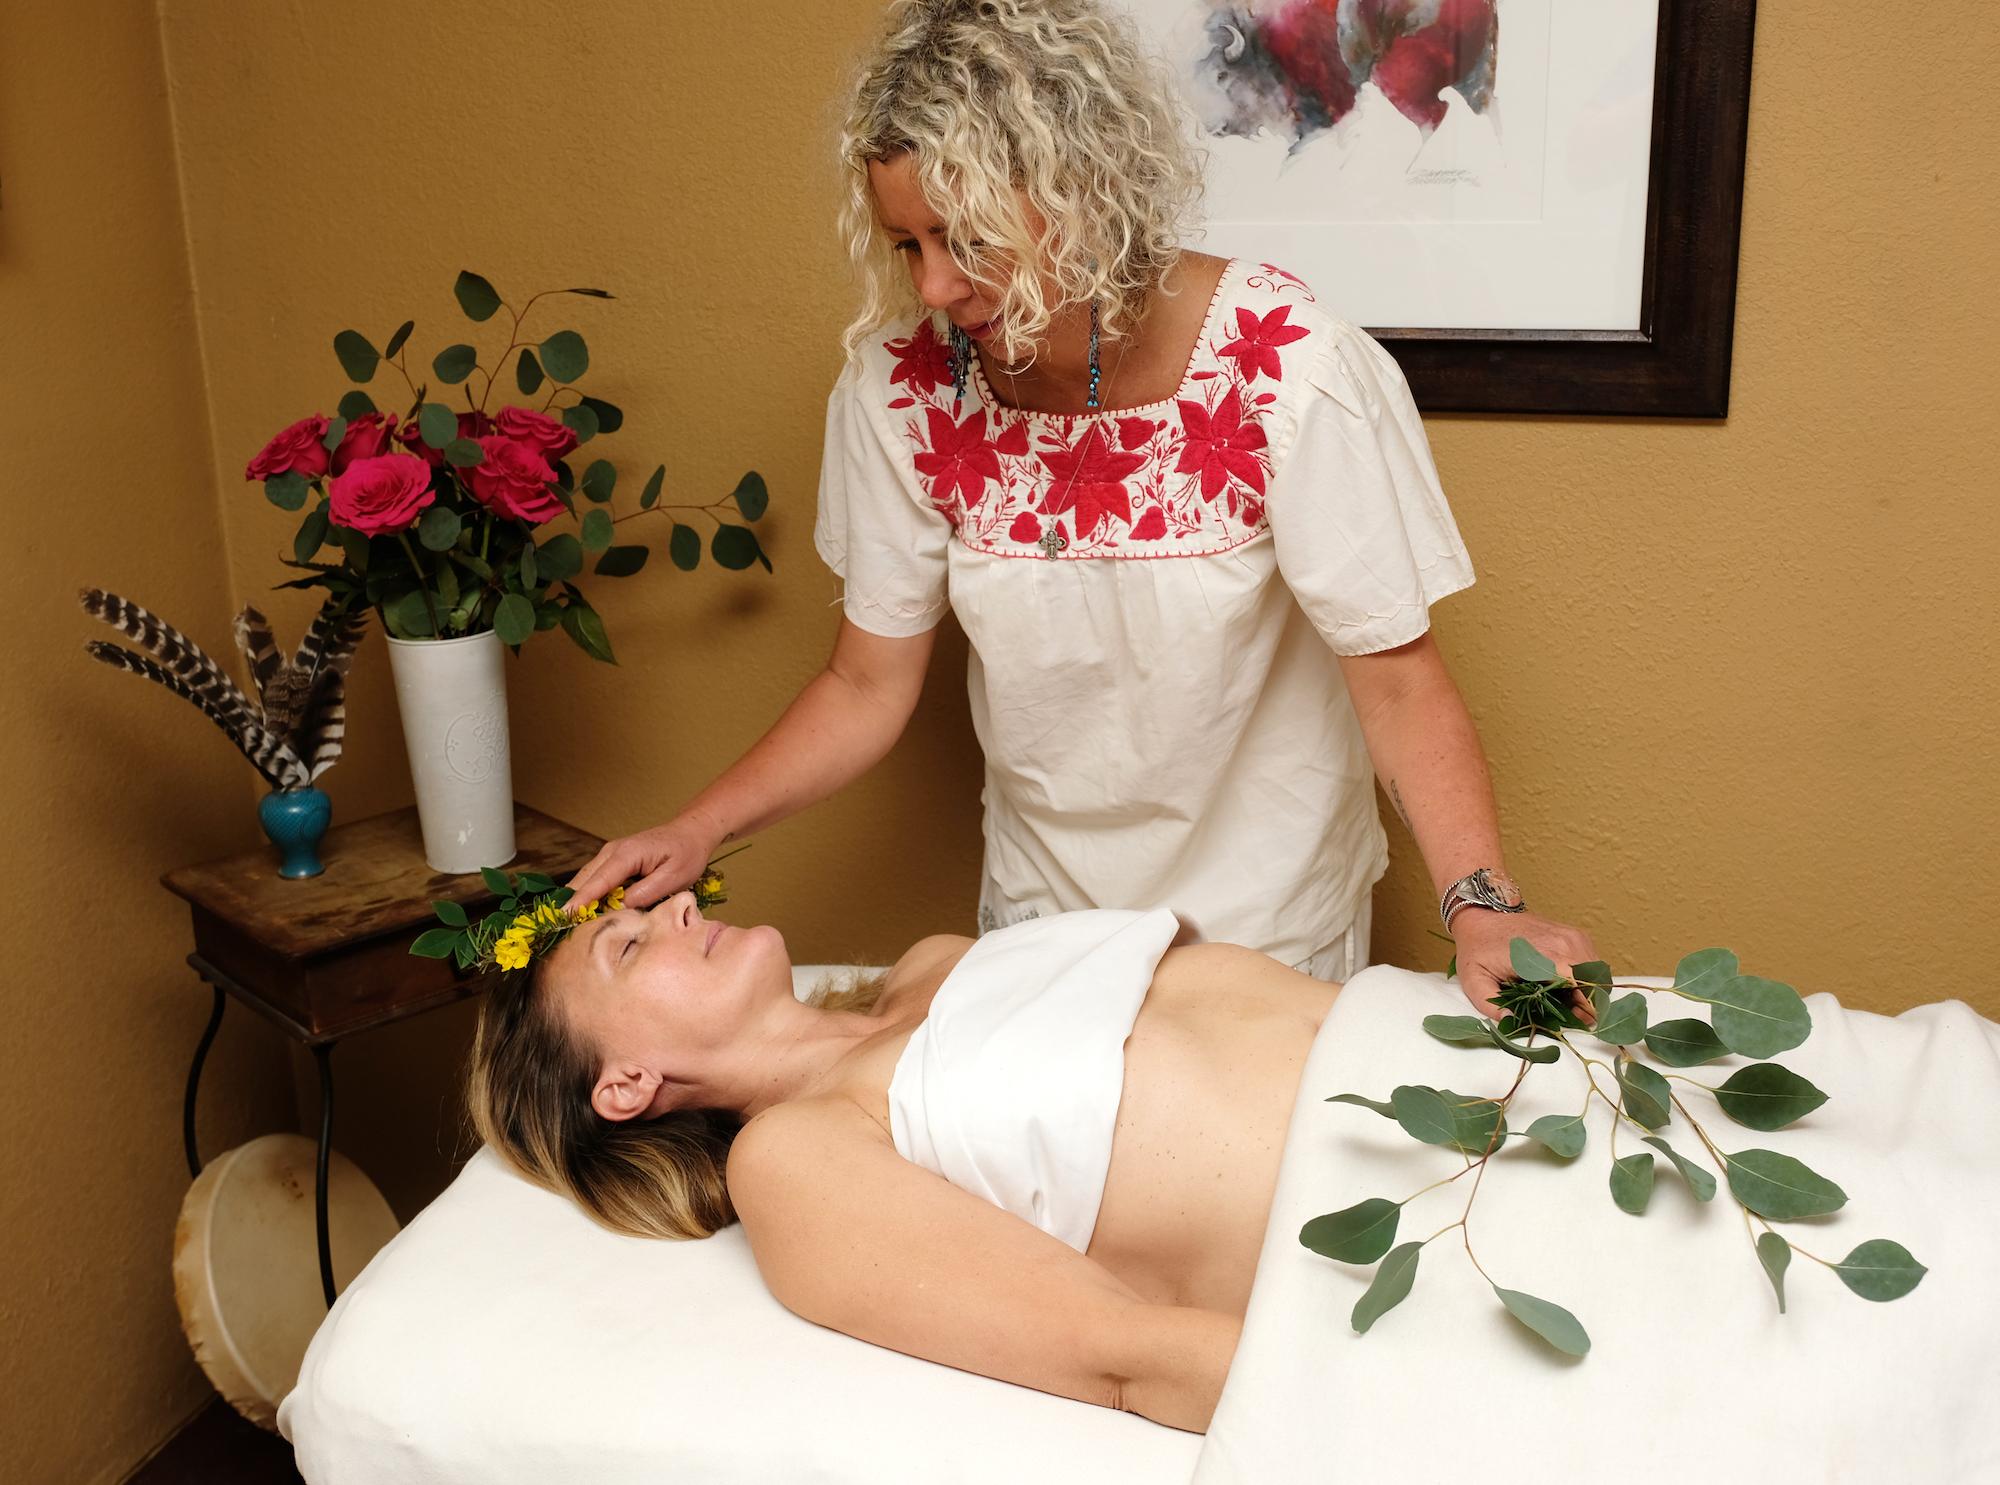 healing hands balance chakras during energy healing session